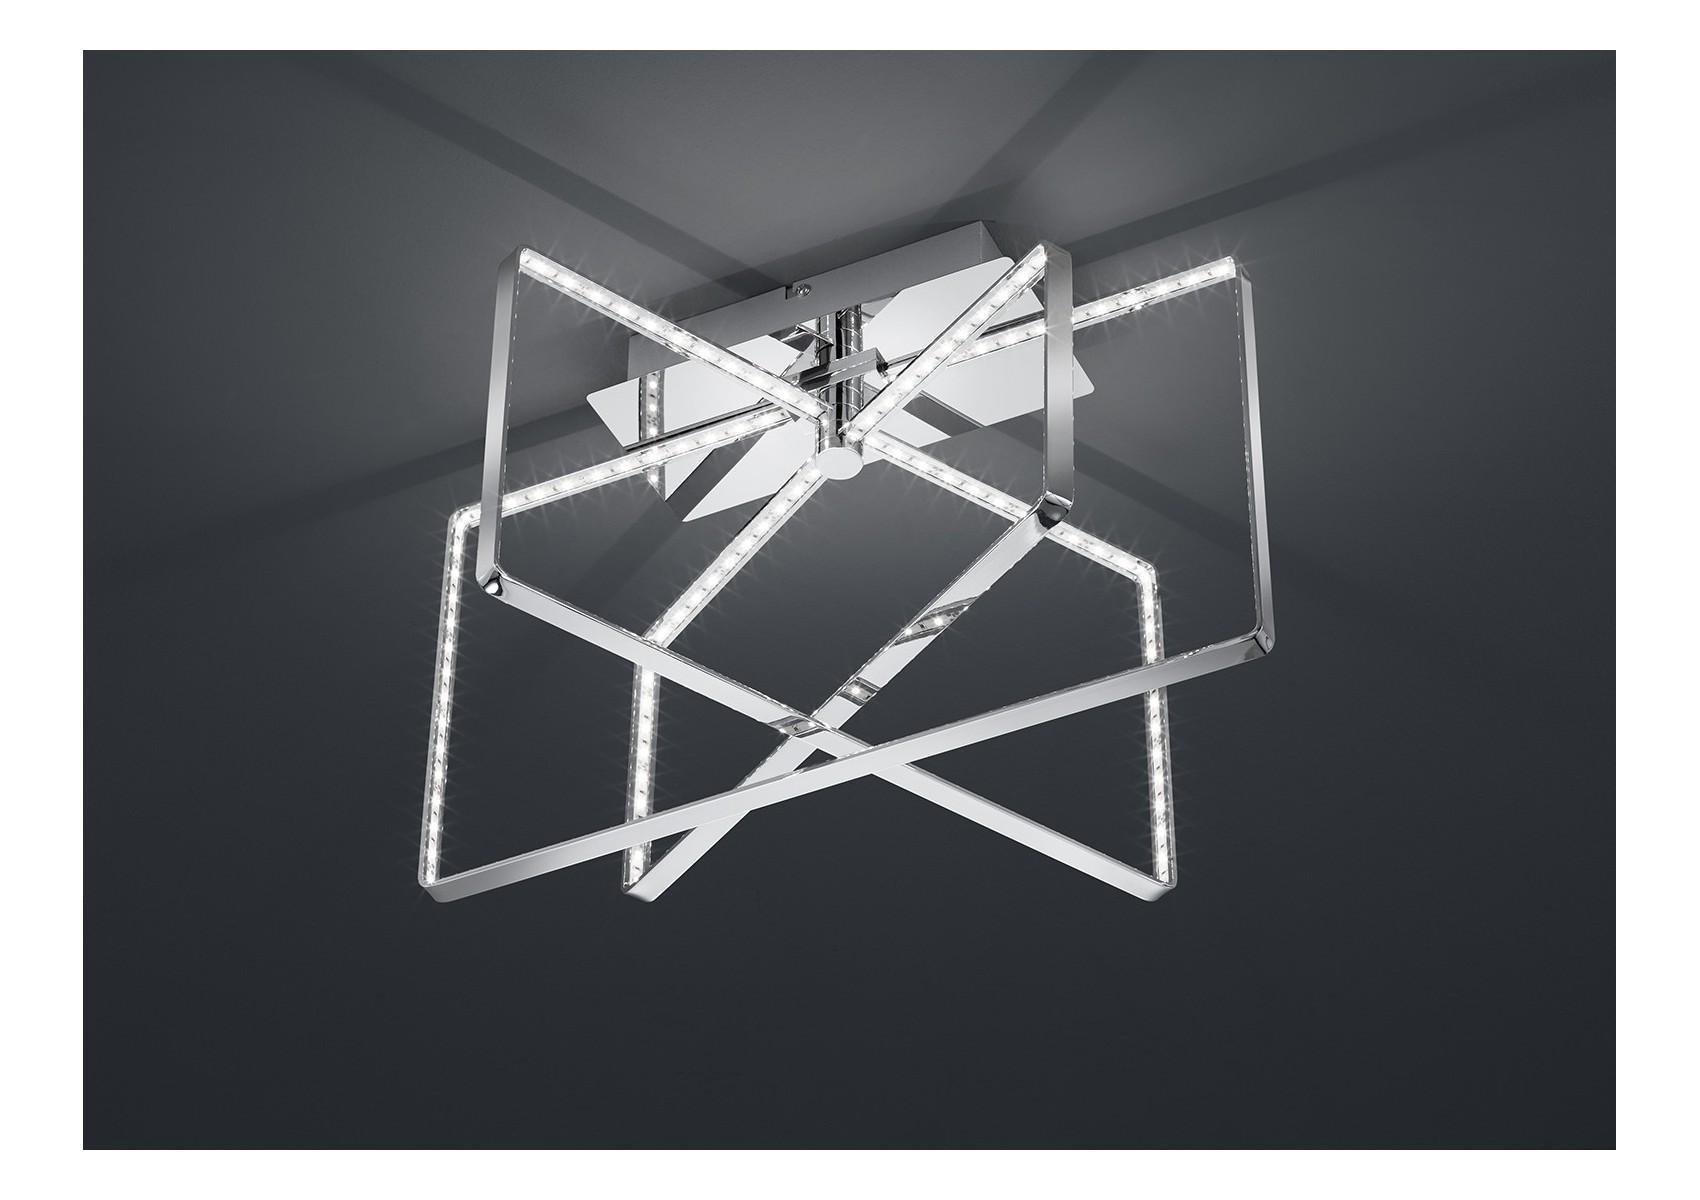 plafonnier design led tivoli boite design. Black Bedroom Furniture Sets. Home Design Ideas